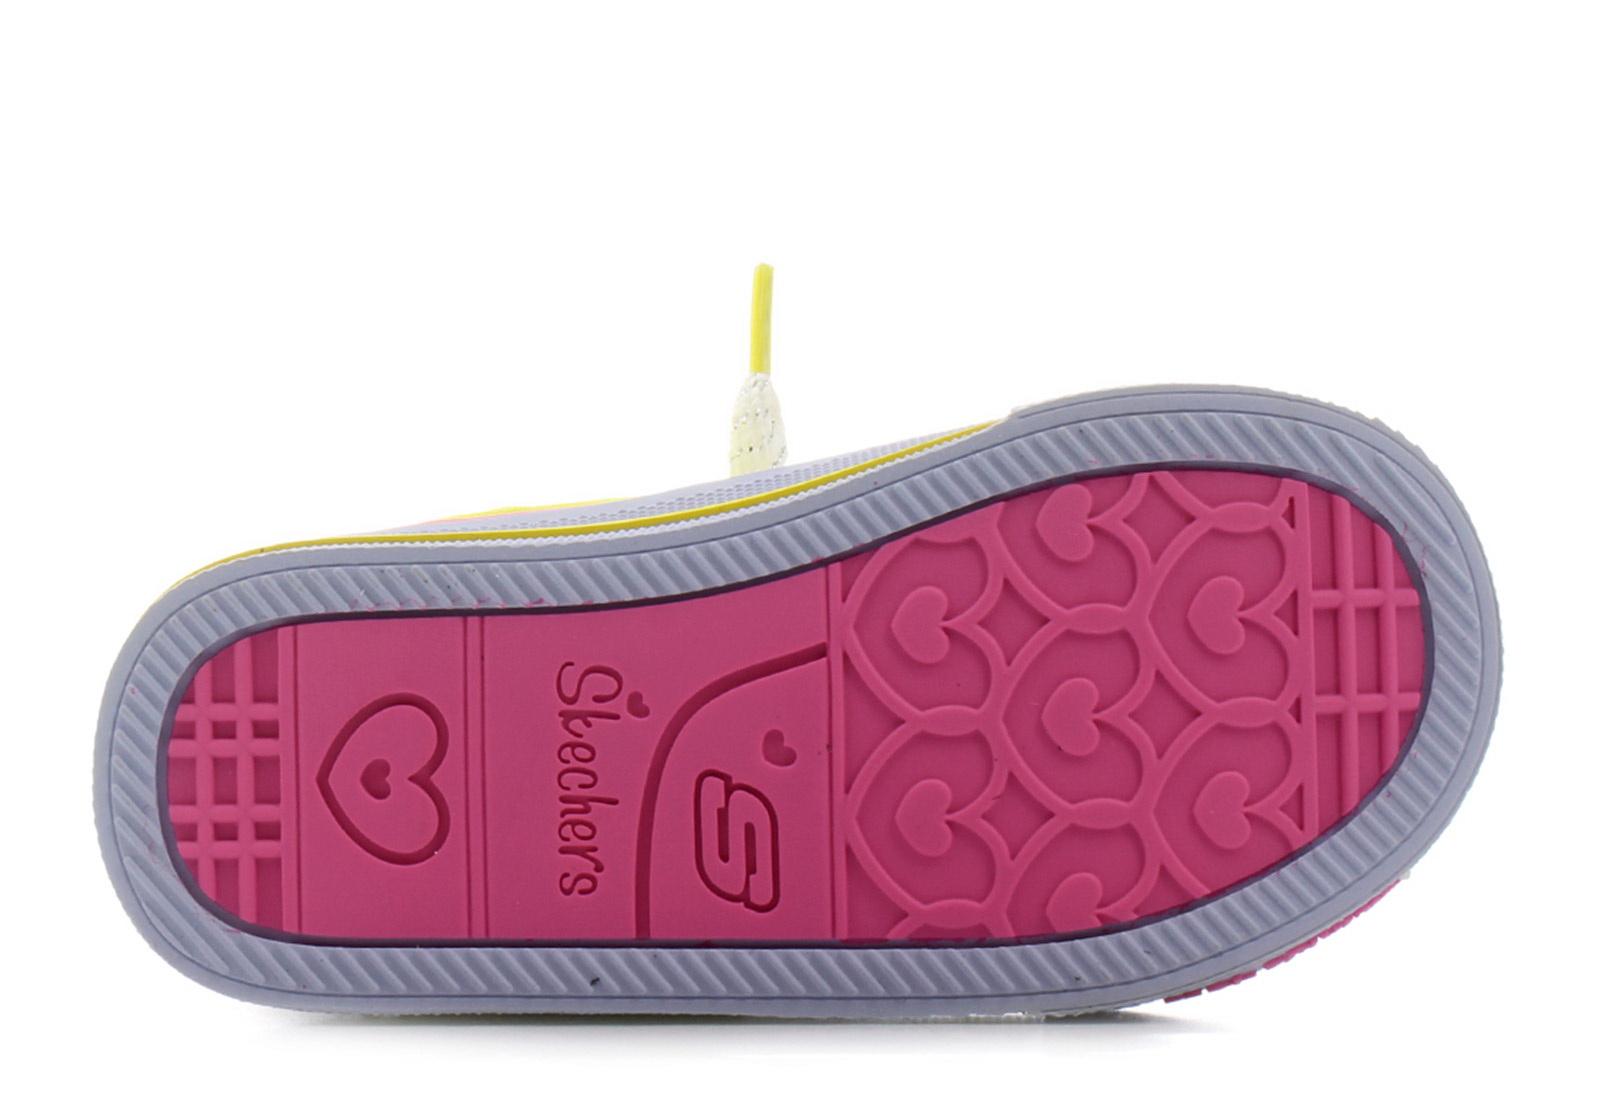 314275ca3fe Skechers Shoes - Shuffles - Sparkle Smile - 10855n-ylhp - Online ...